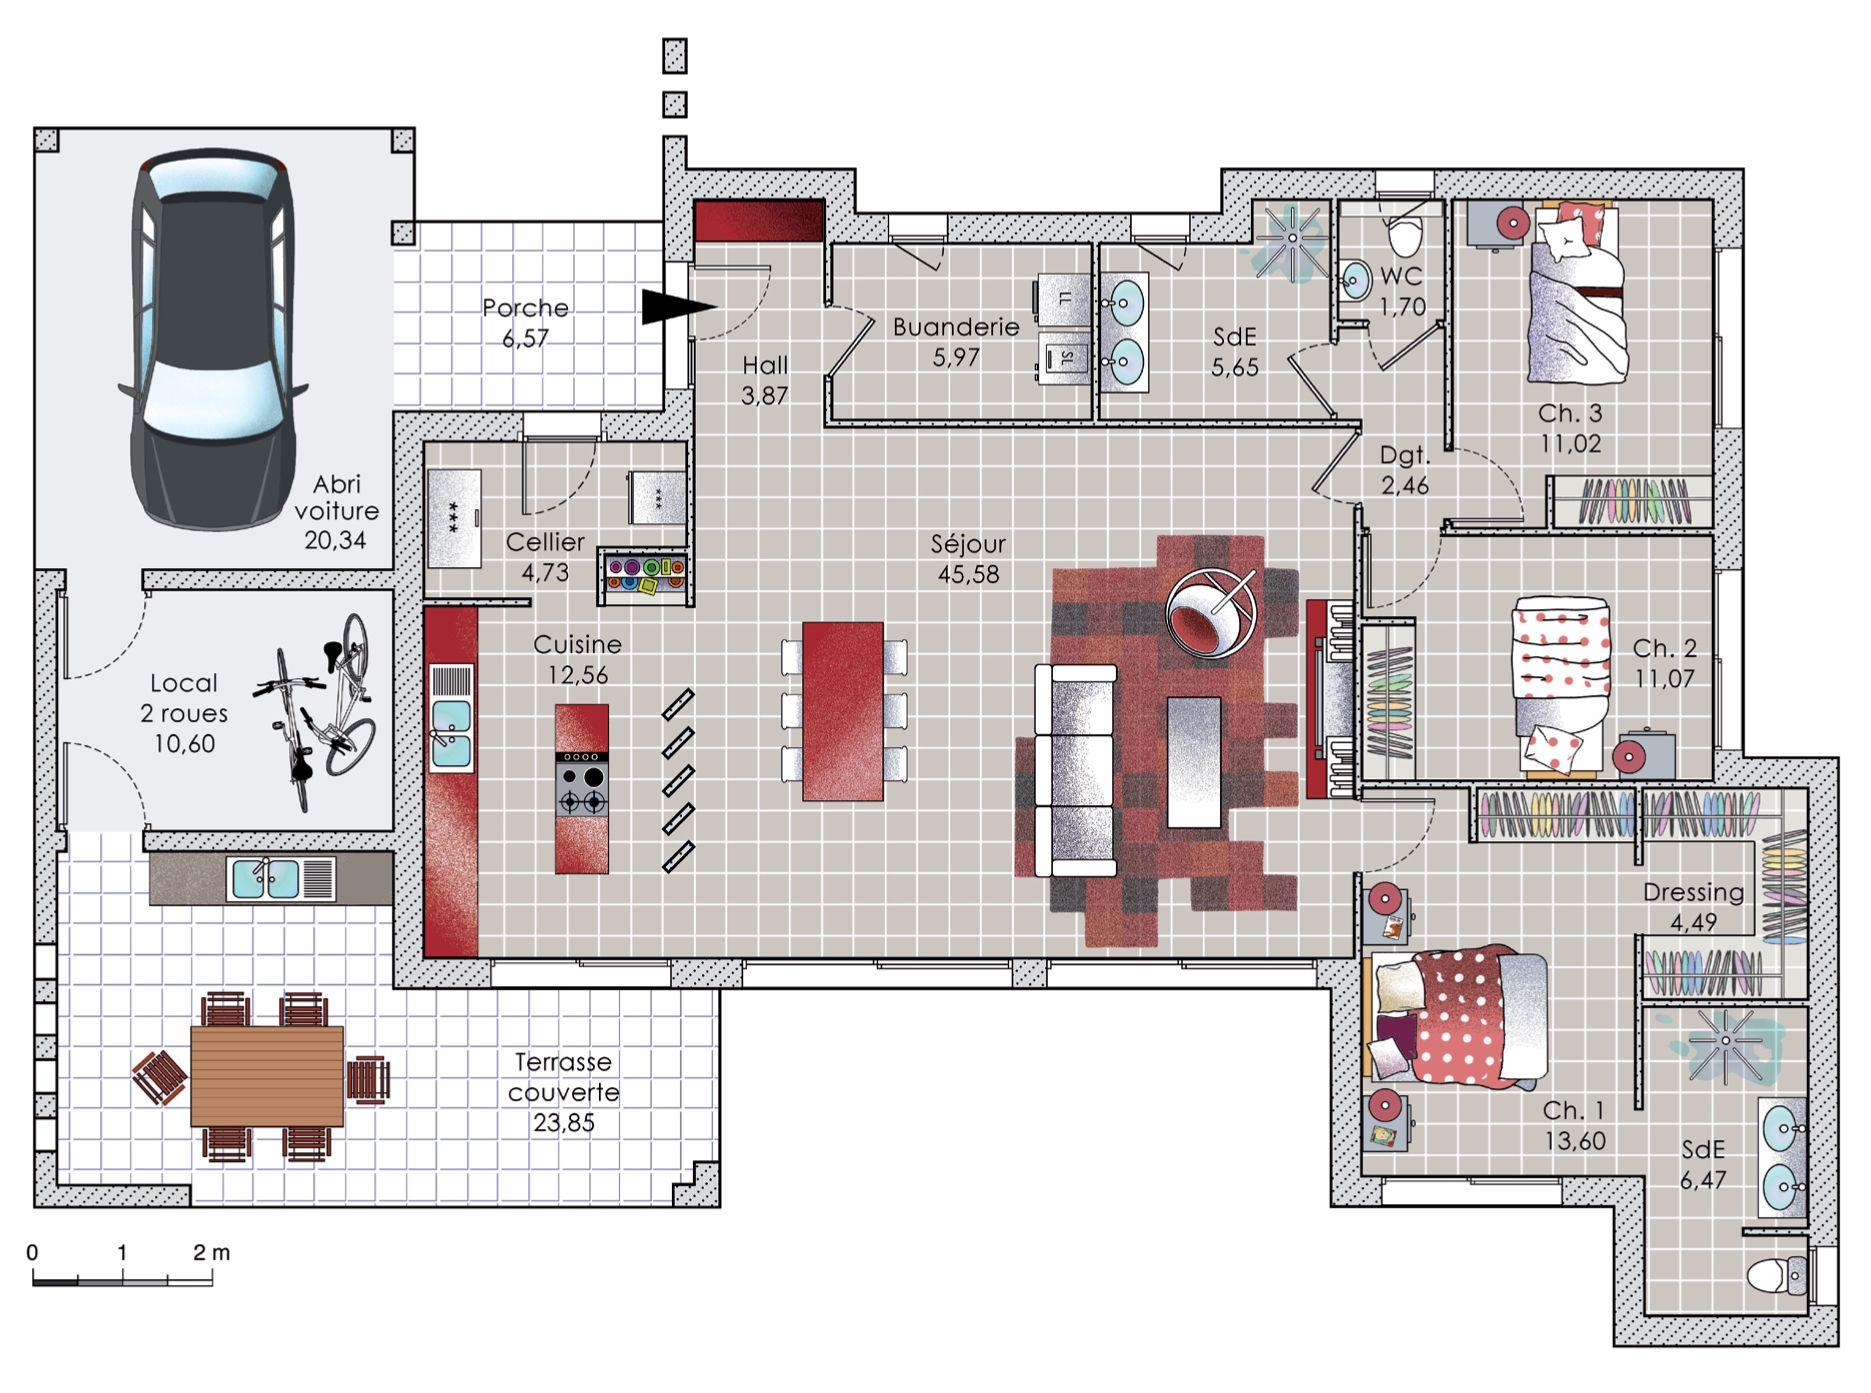 De Haute Qualite Maison   Tilla   Bati Sud   179990 Euros   130 M2 | Faire Construire Sa Idees Etonnantes